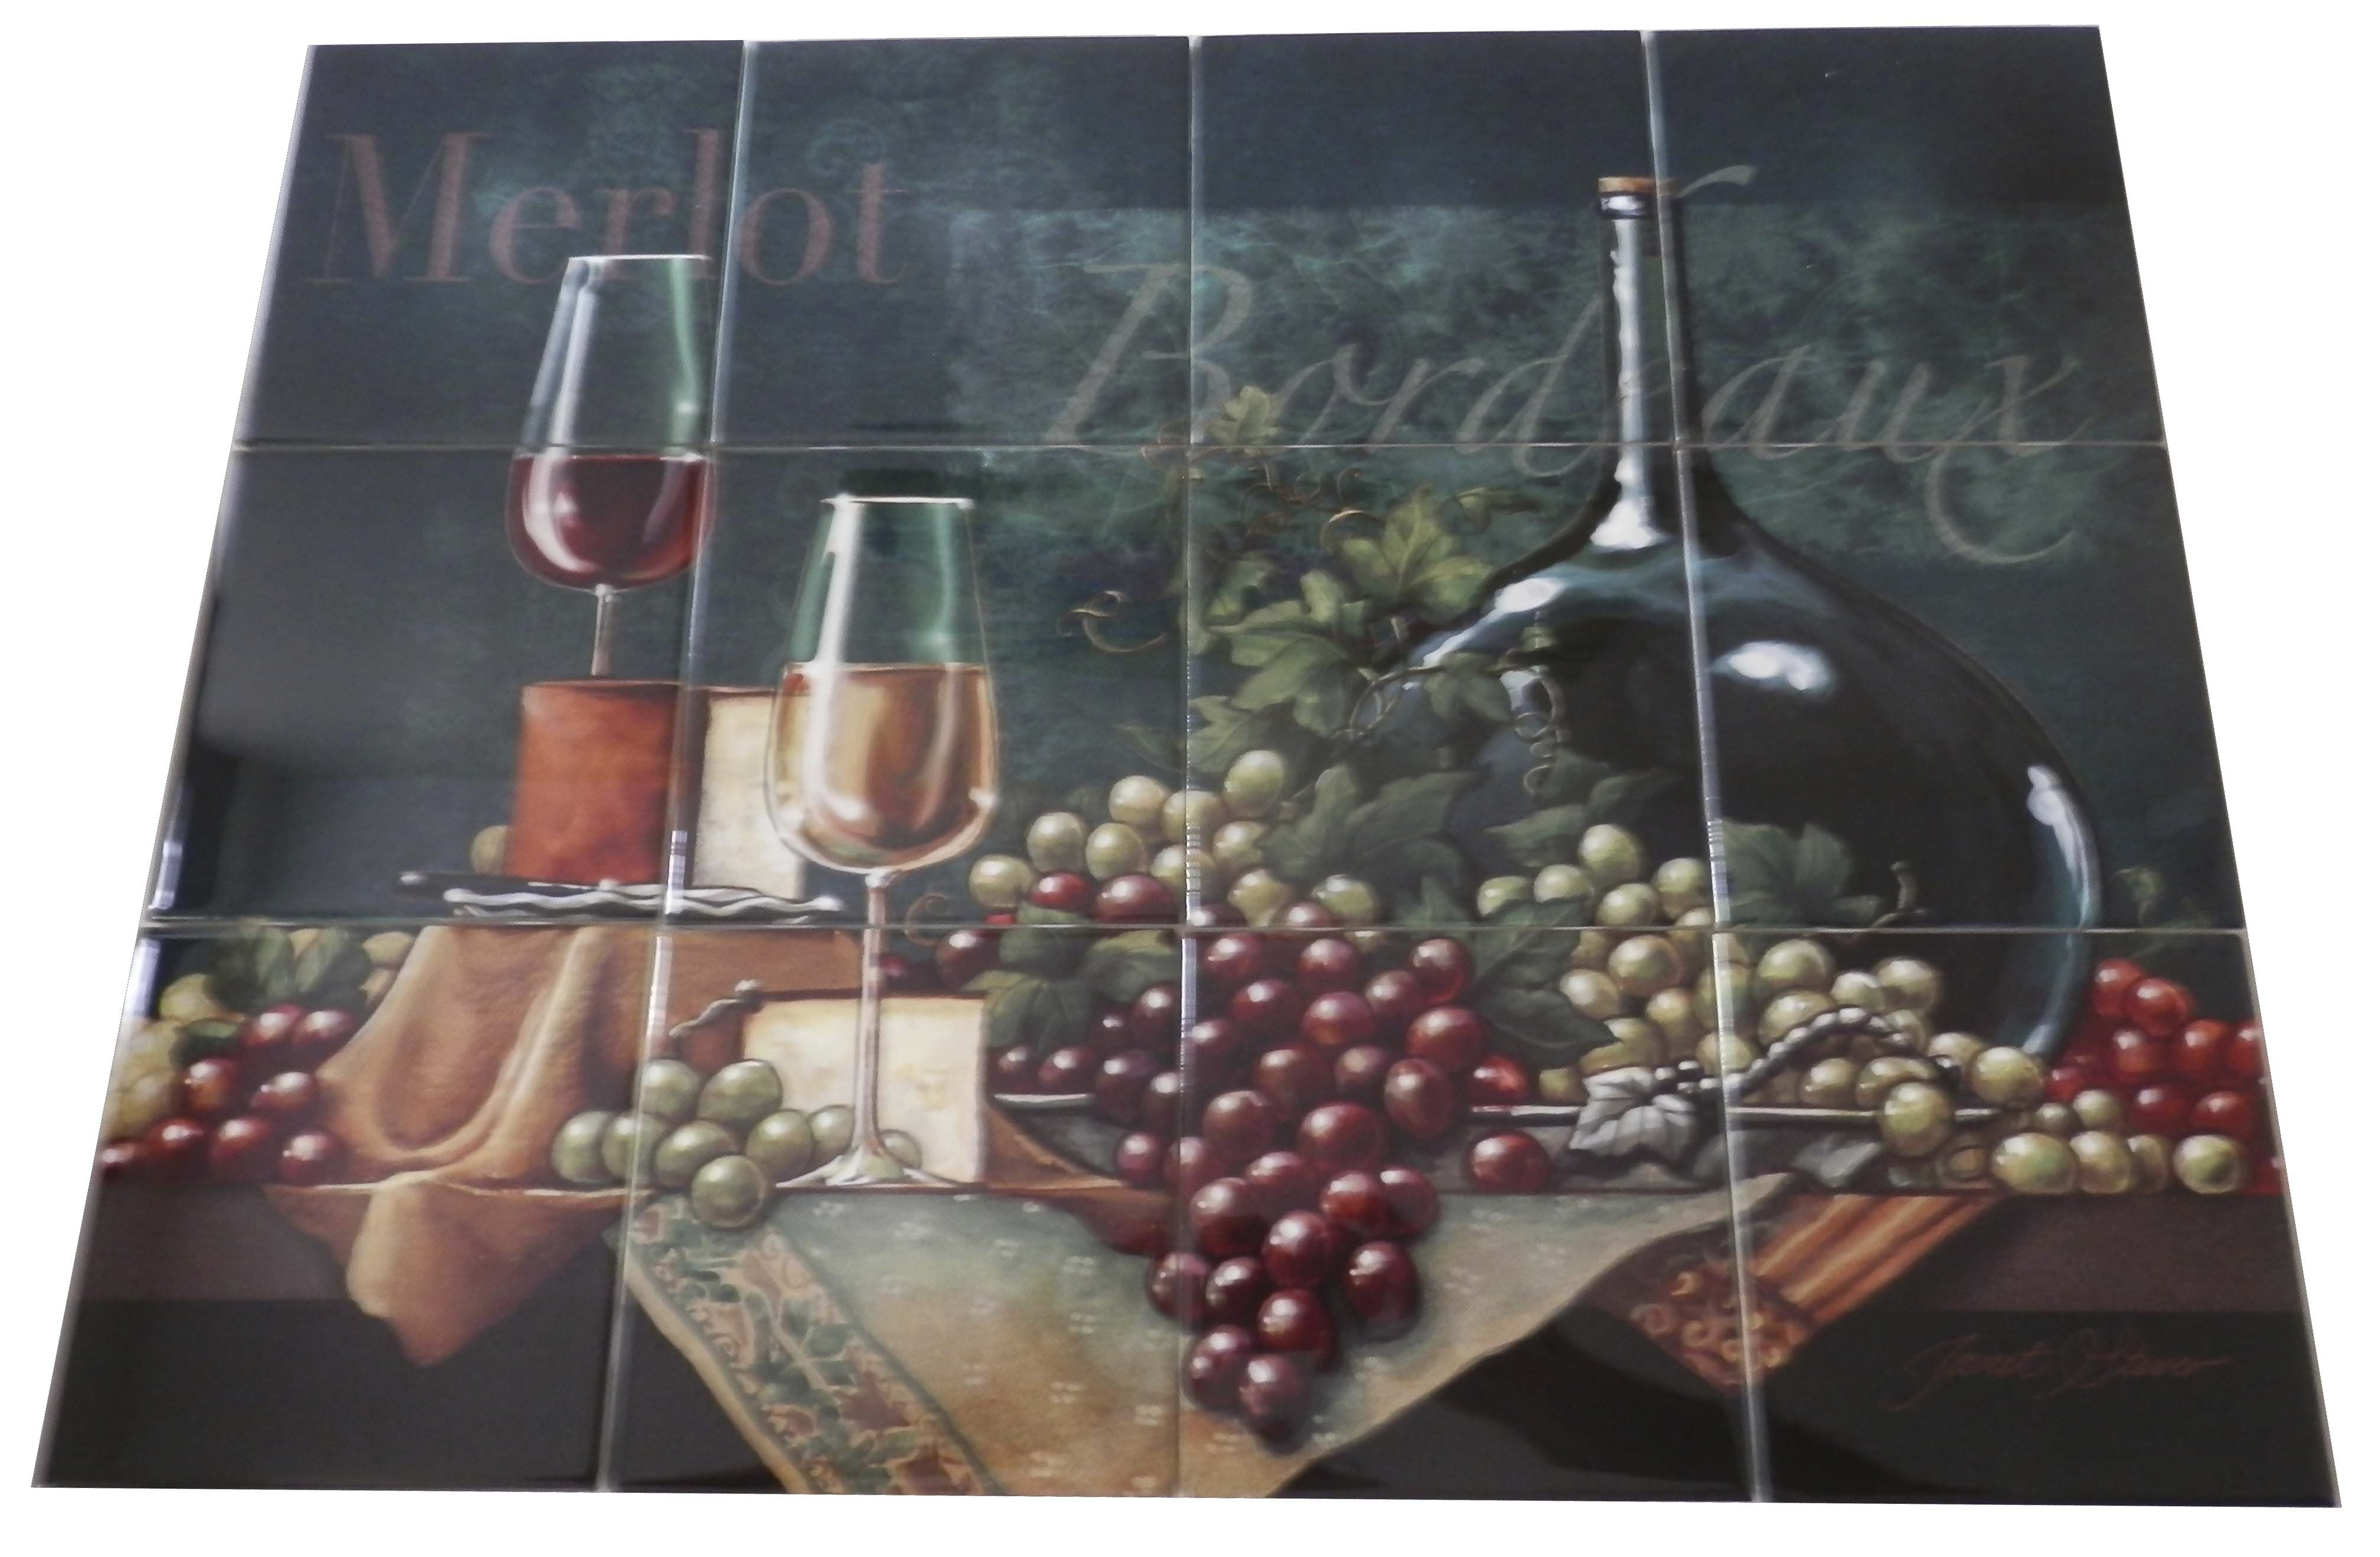 Decorative Wall Tile Murals Inspiration Bordeaux  Js  Tile Mural Our Decorative Tiles With Wine Are Design Ideas